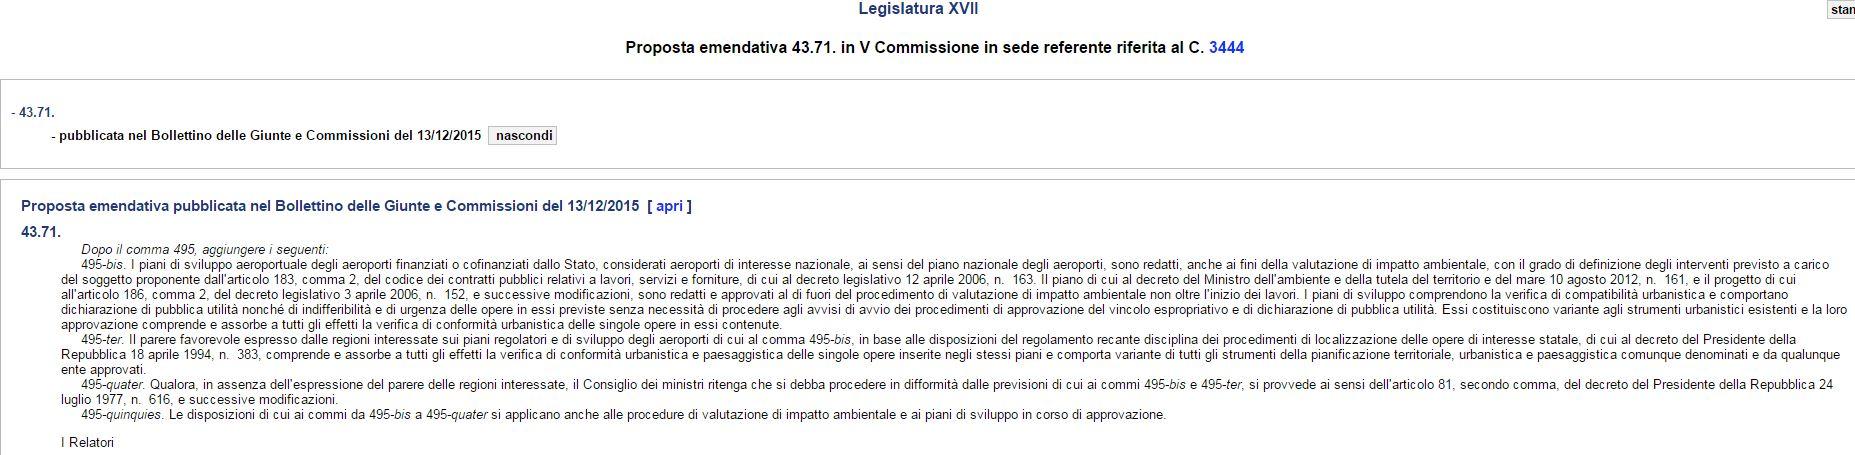 emendamento pd aeroporto firenze VIA - 2